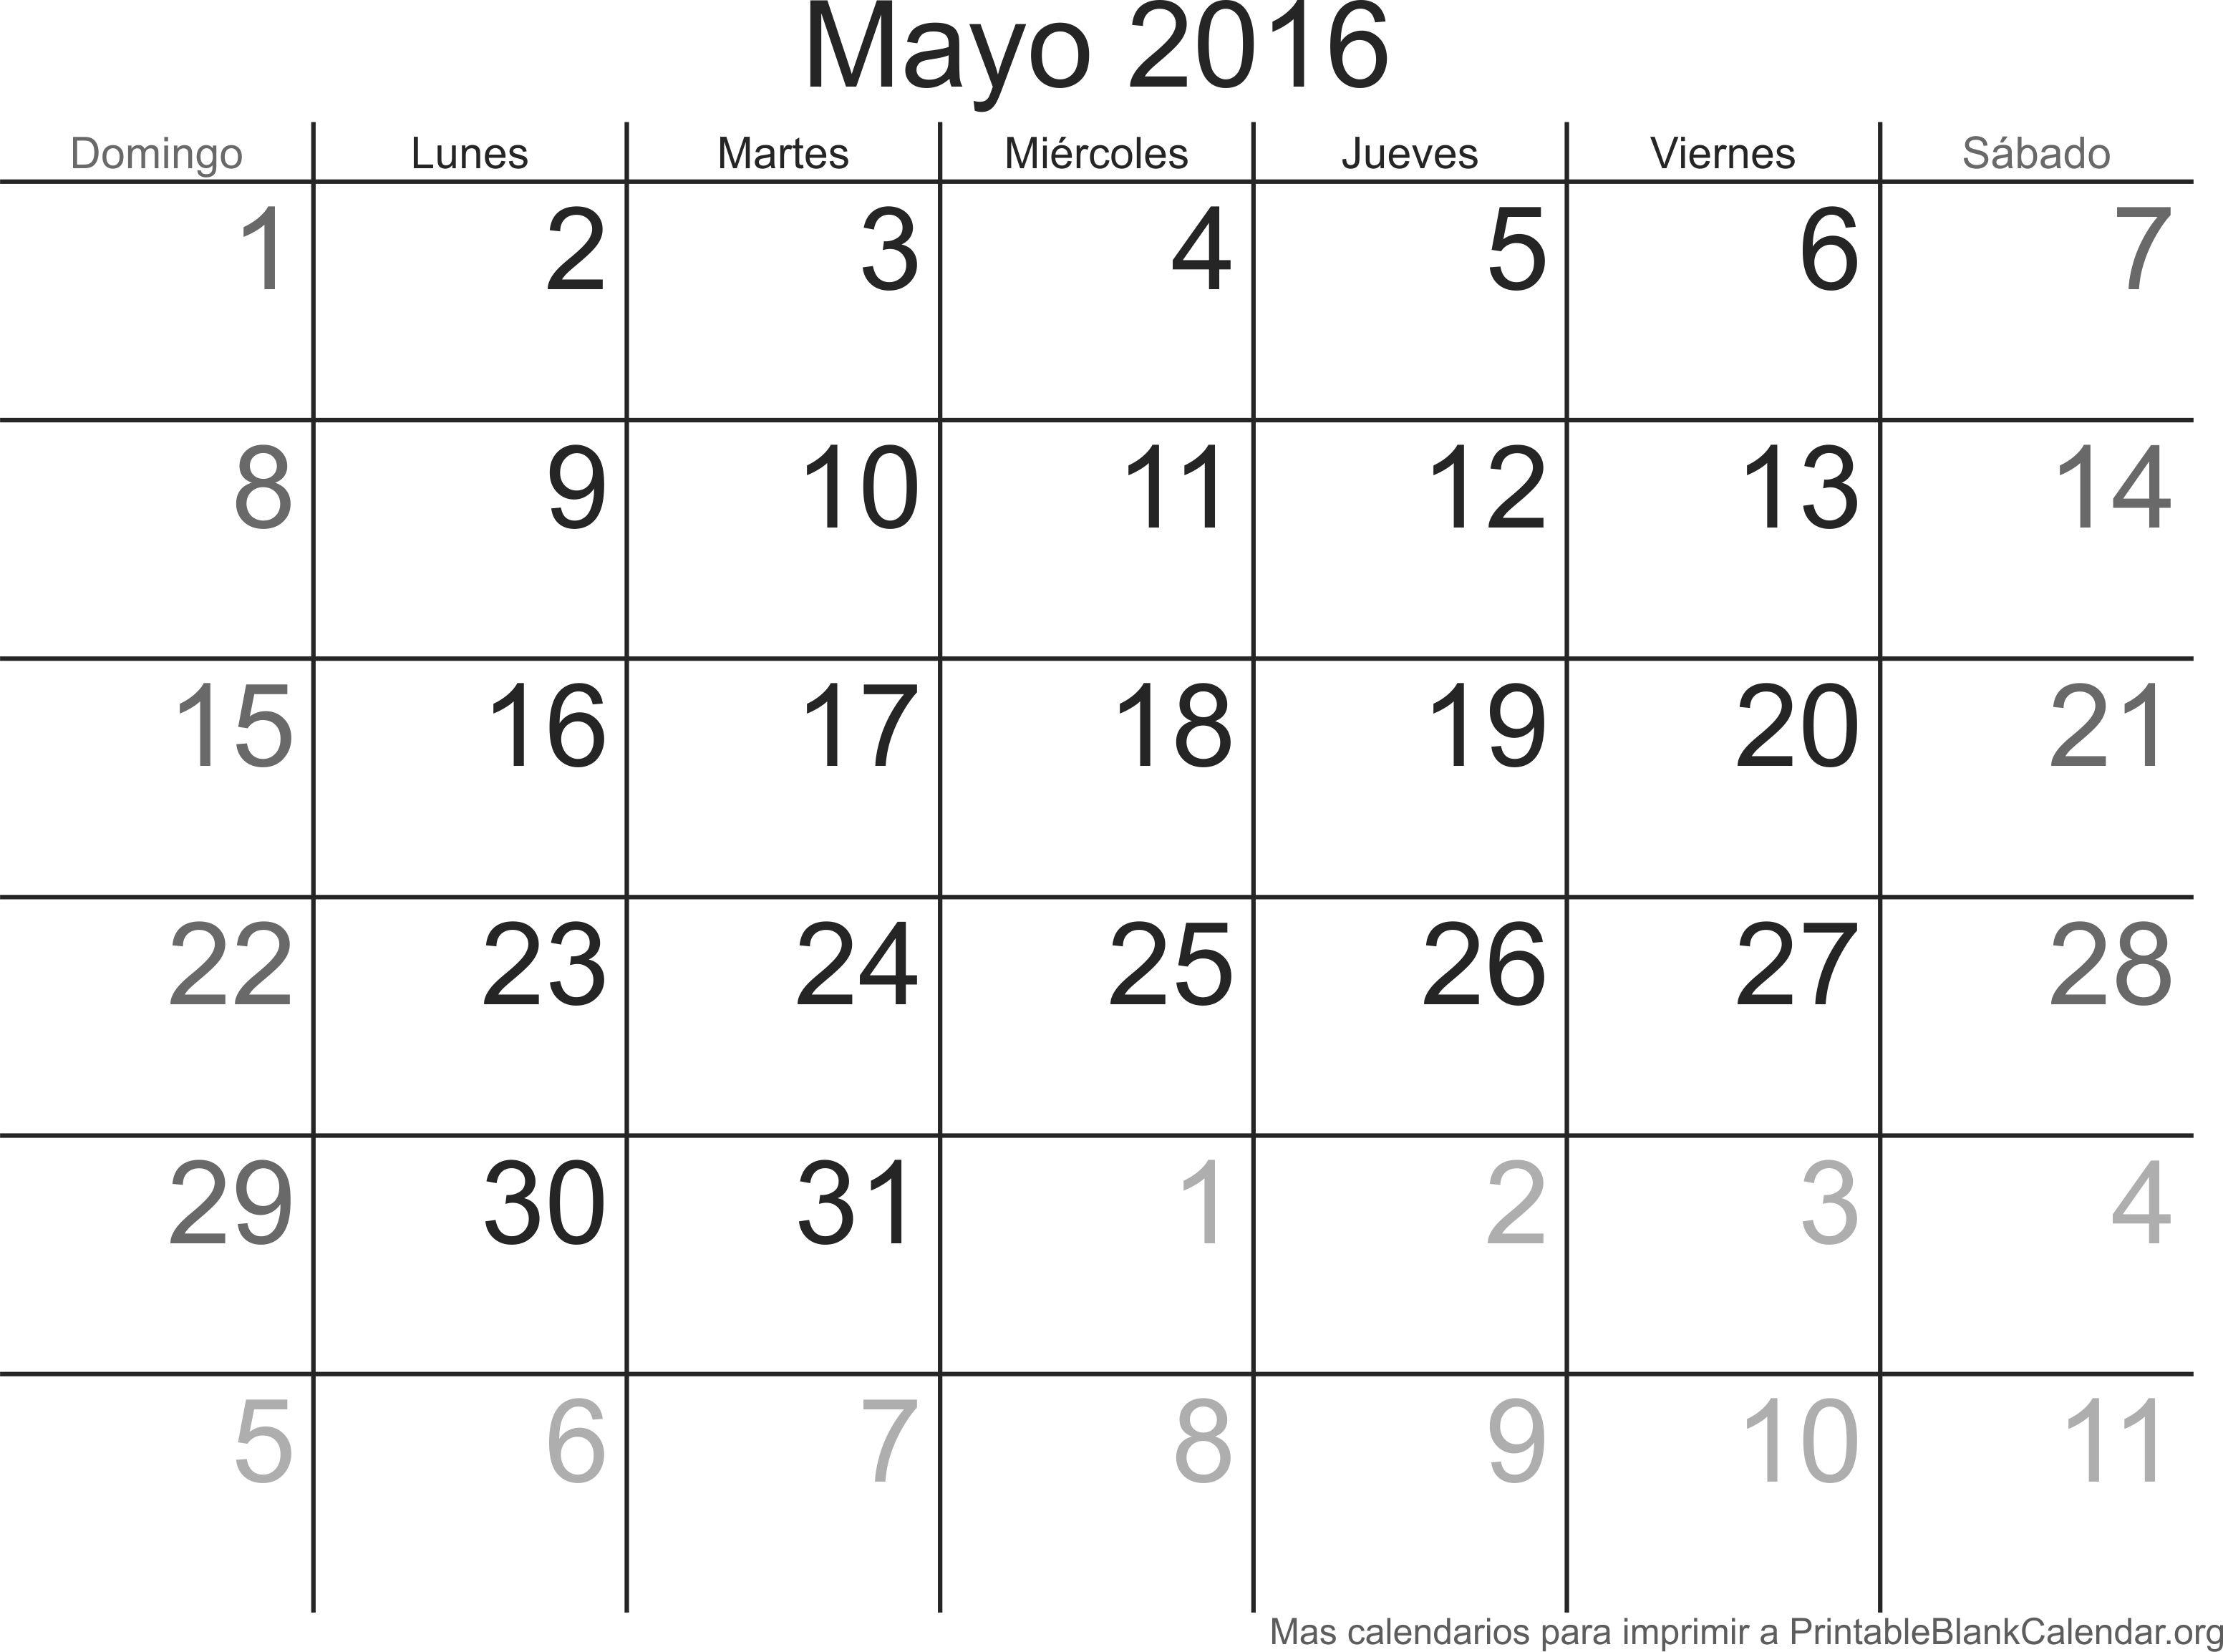 May 2016 calendario